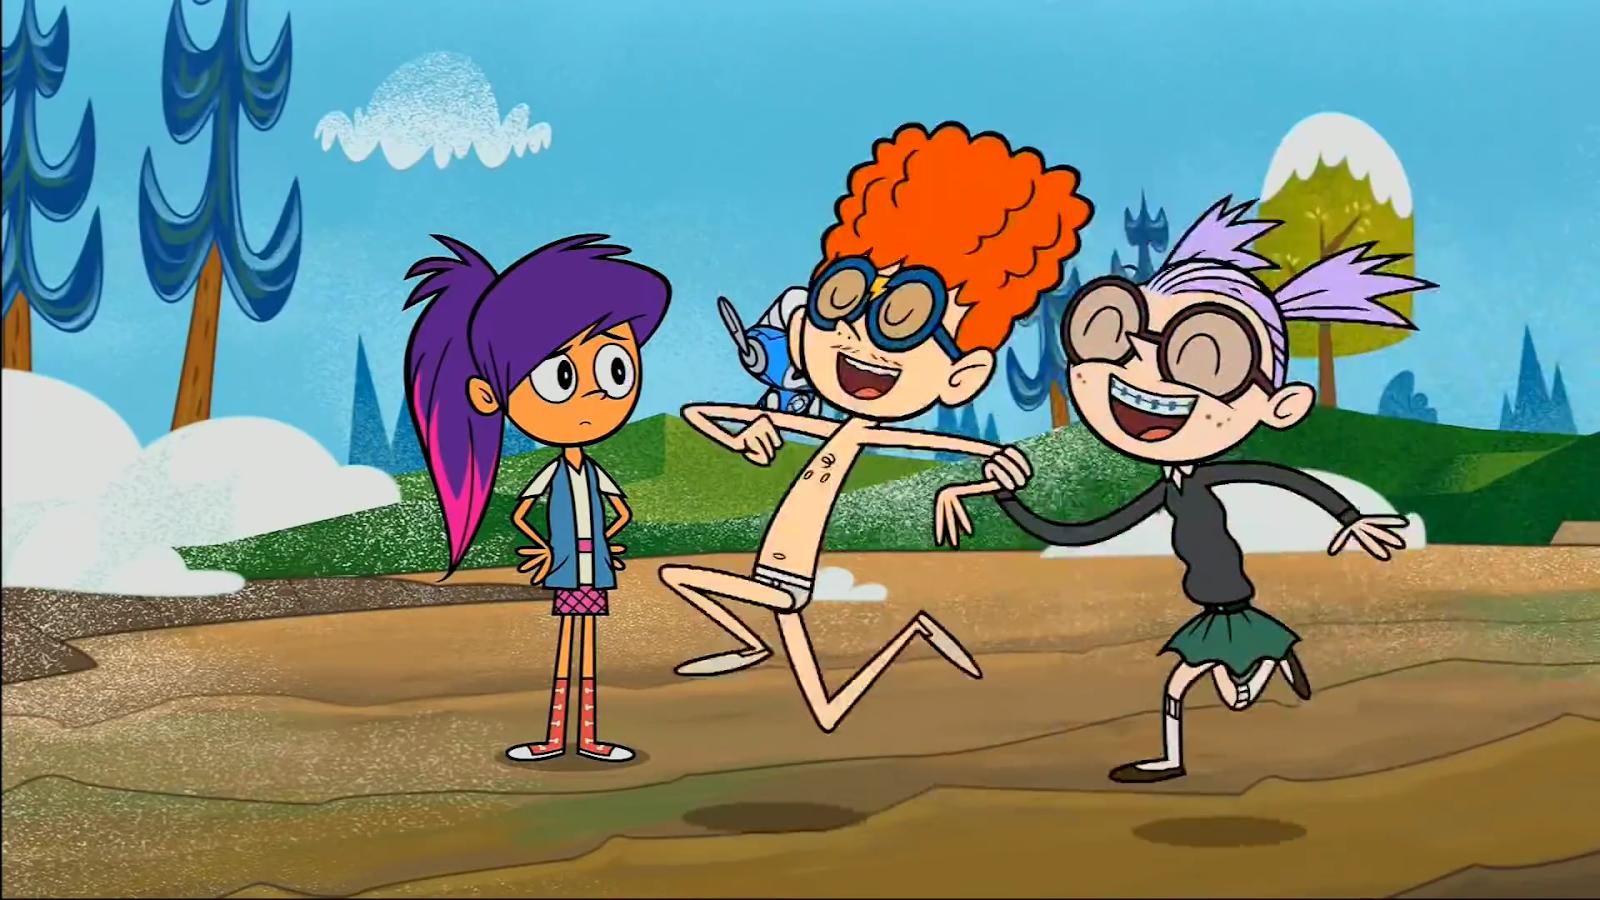 Cartoon Shirtless Boys: Dan in his underwear 2